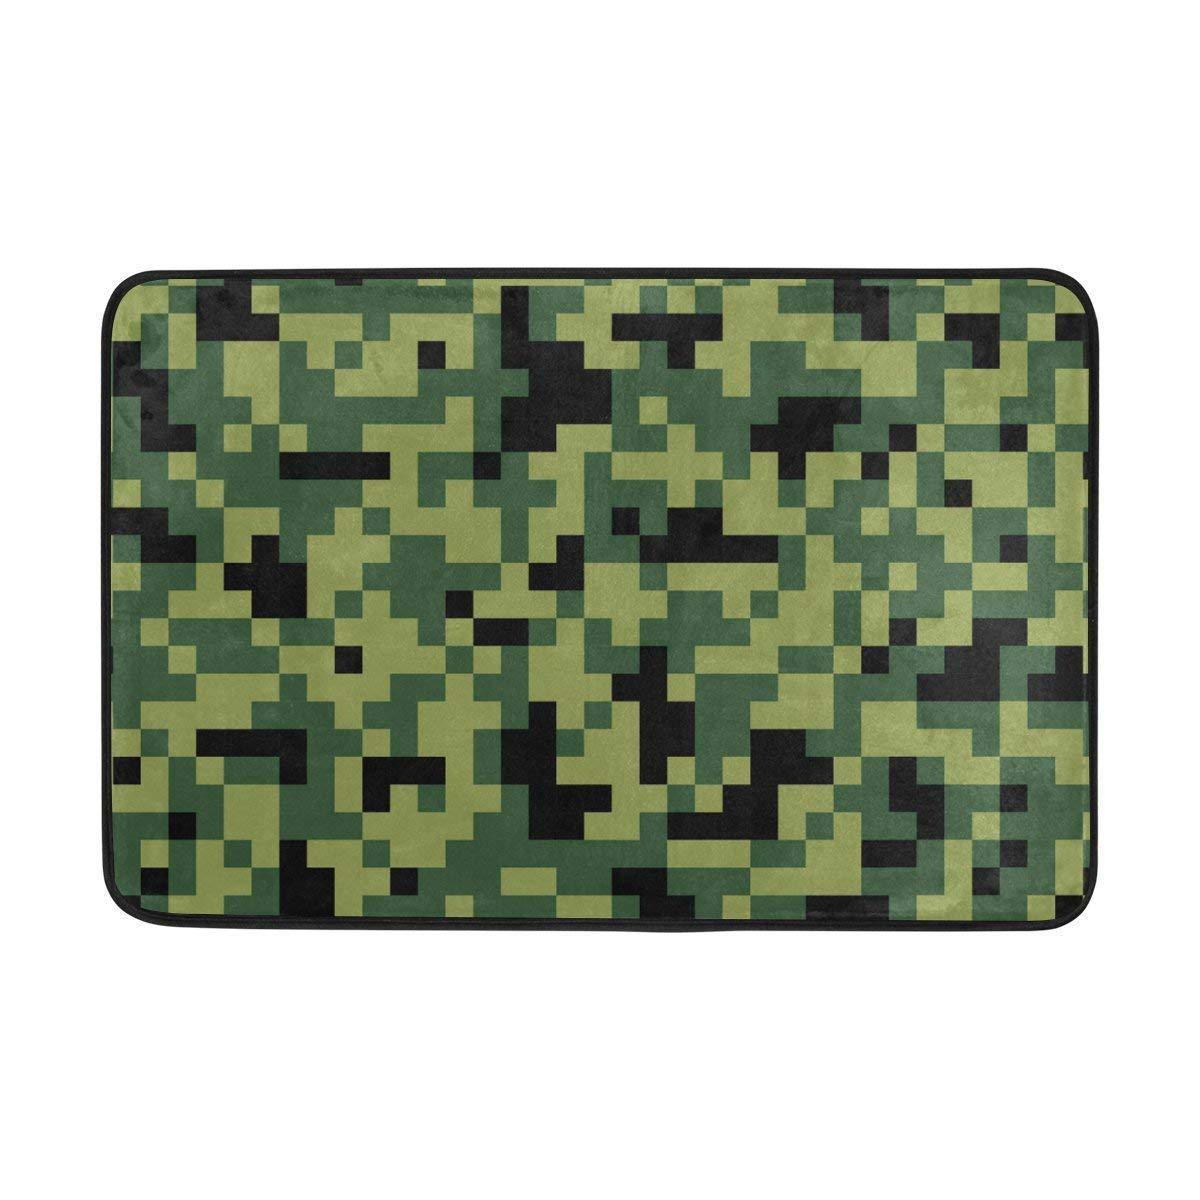 minecraft rug